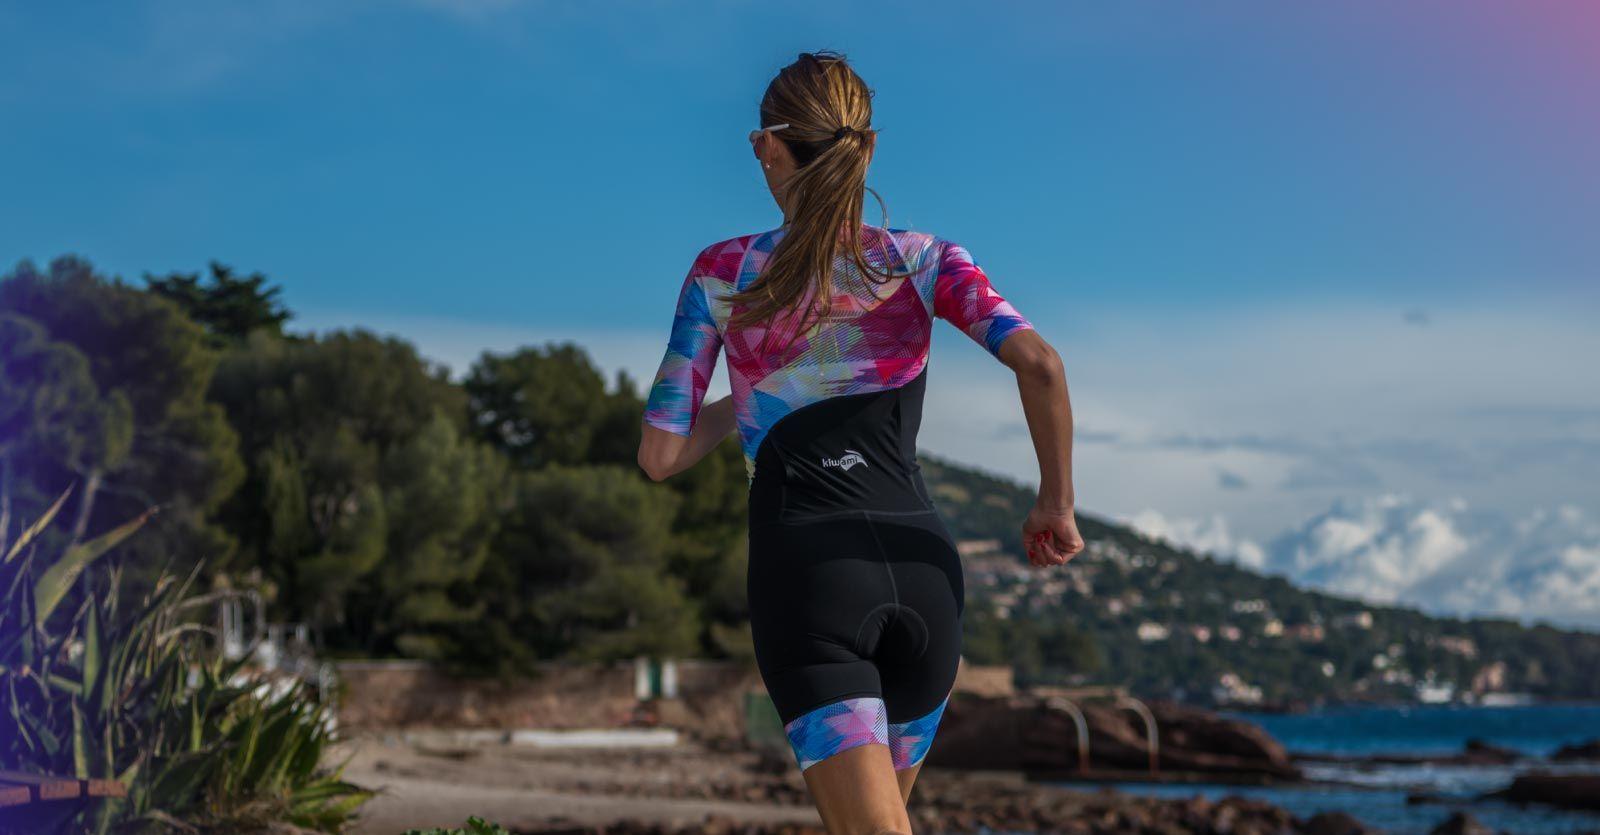 d35de534a0bb24 Women triathlon kit for ironman triathlon kiwami   KIWAMI - Women's ...